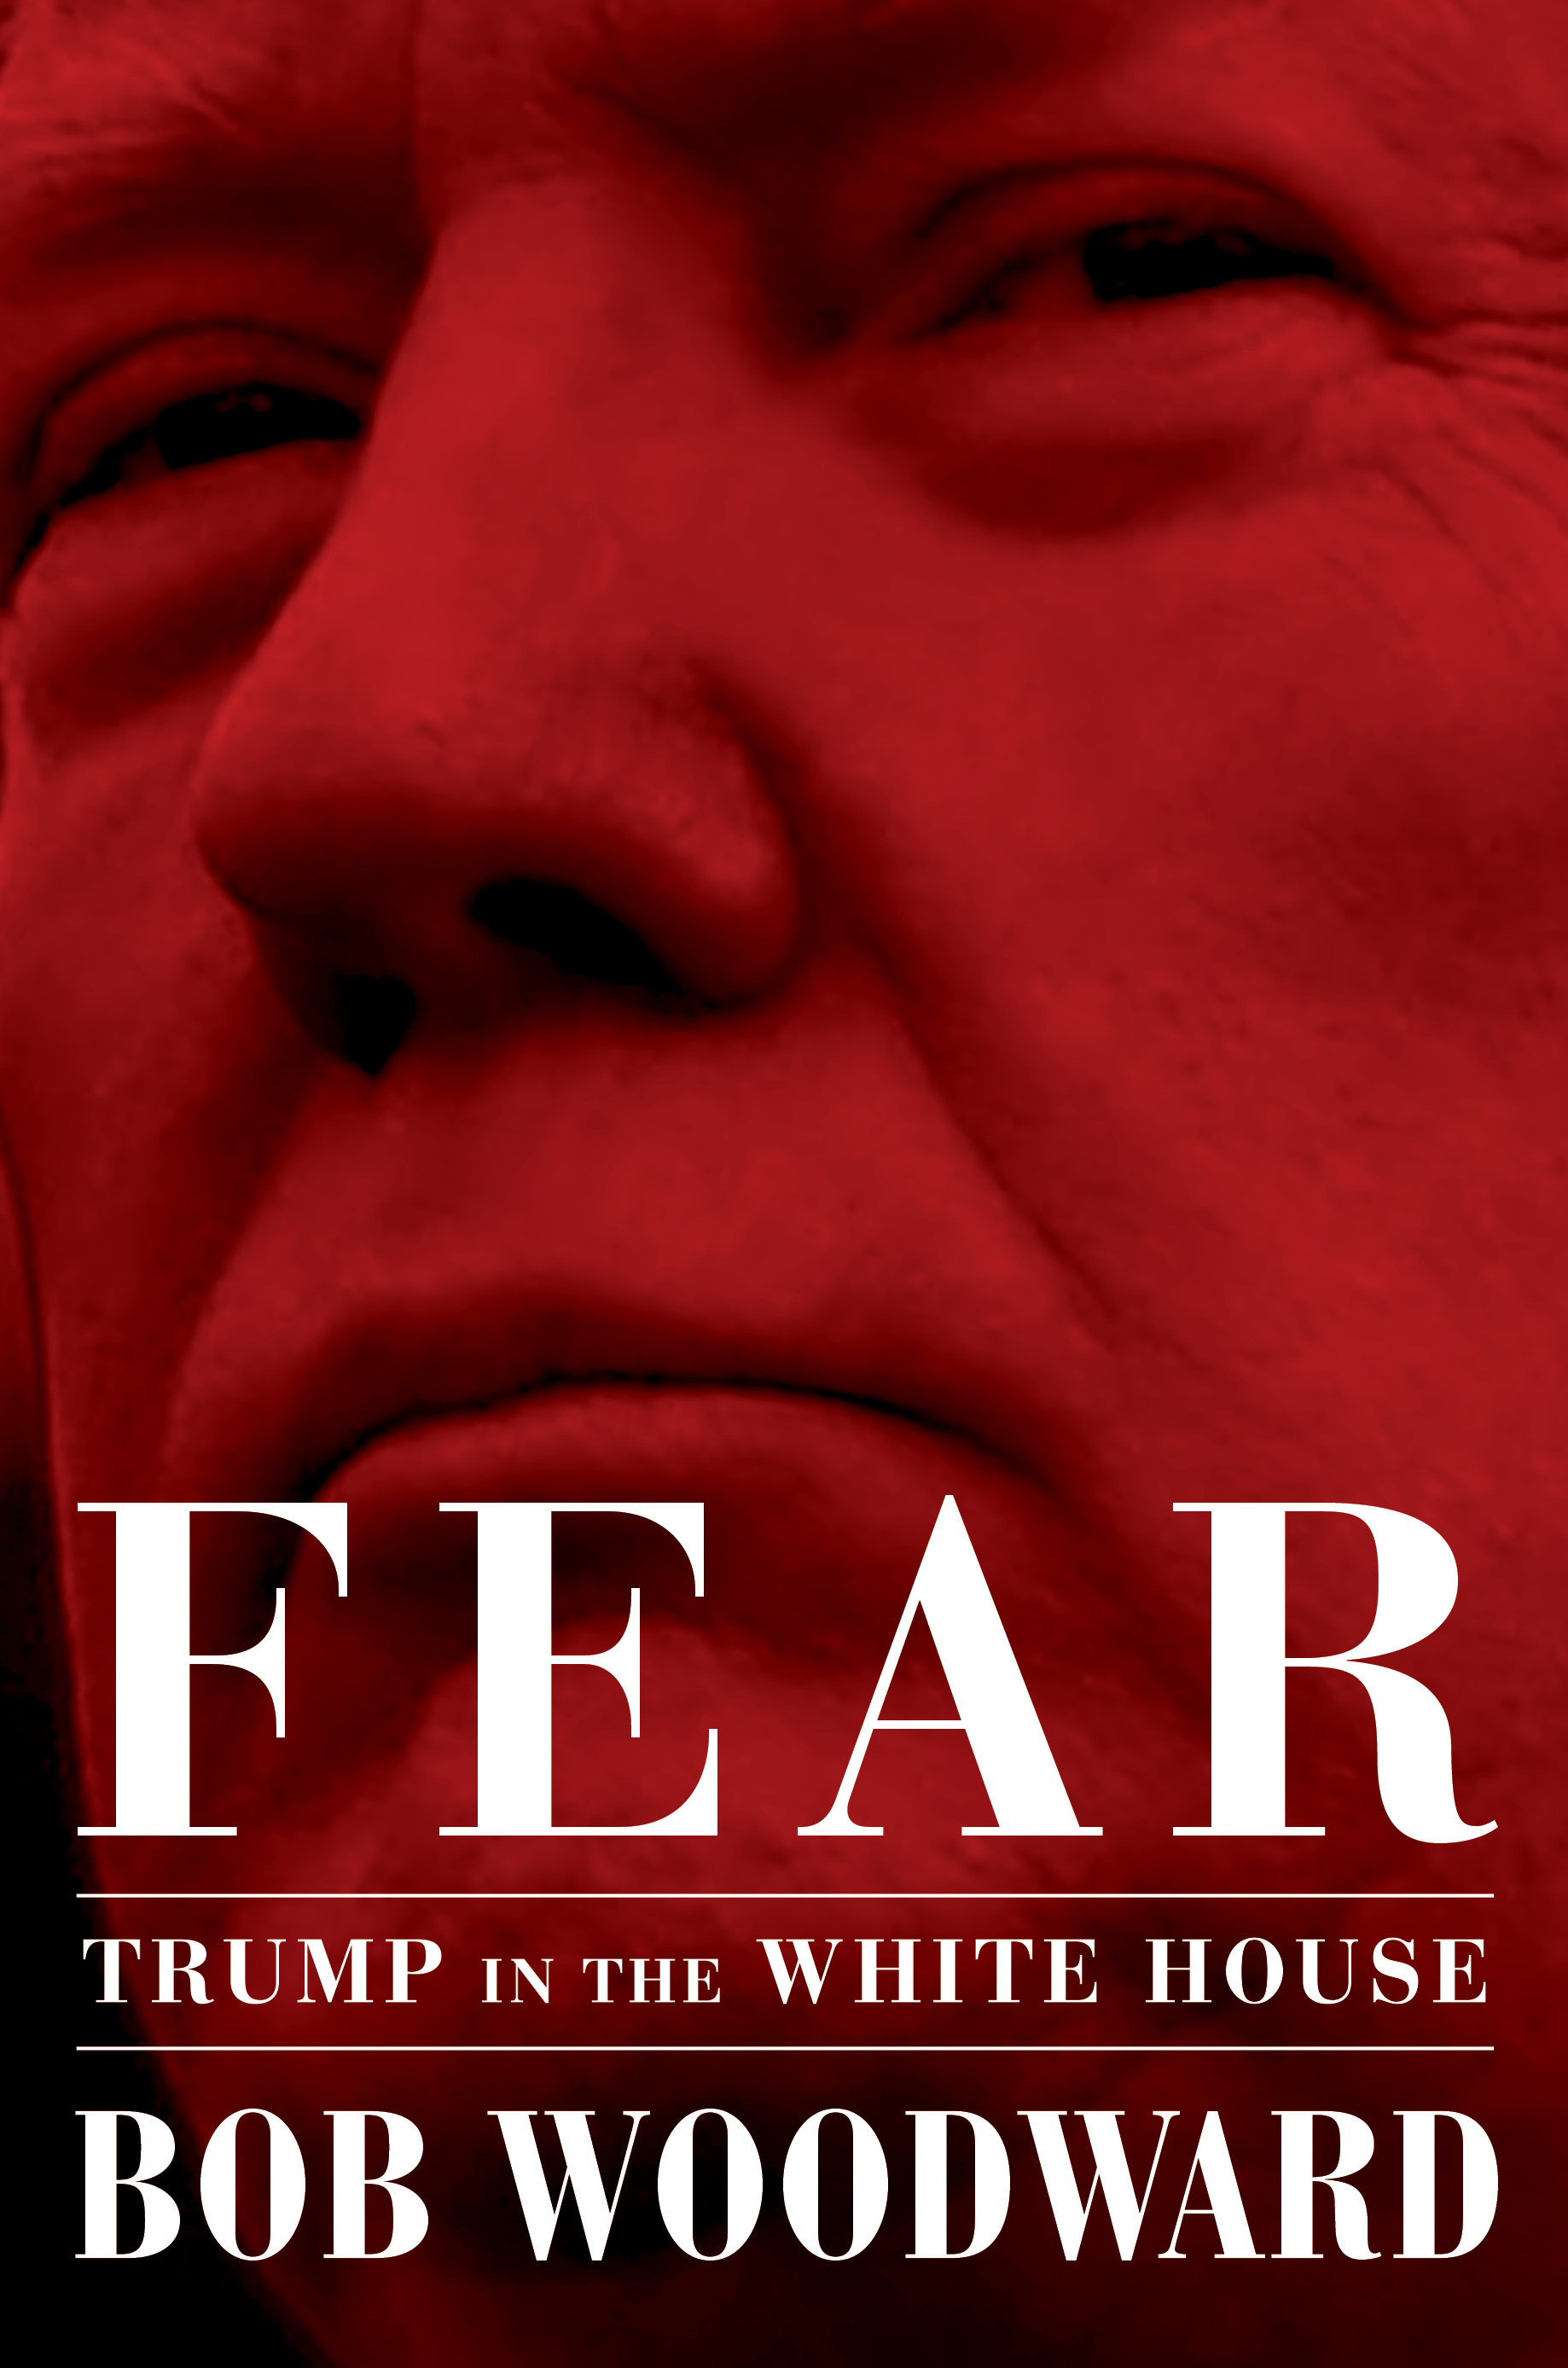 woodward book on trump washington post